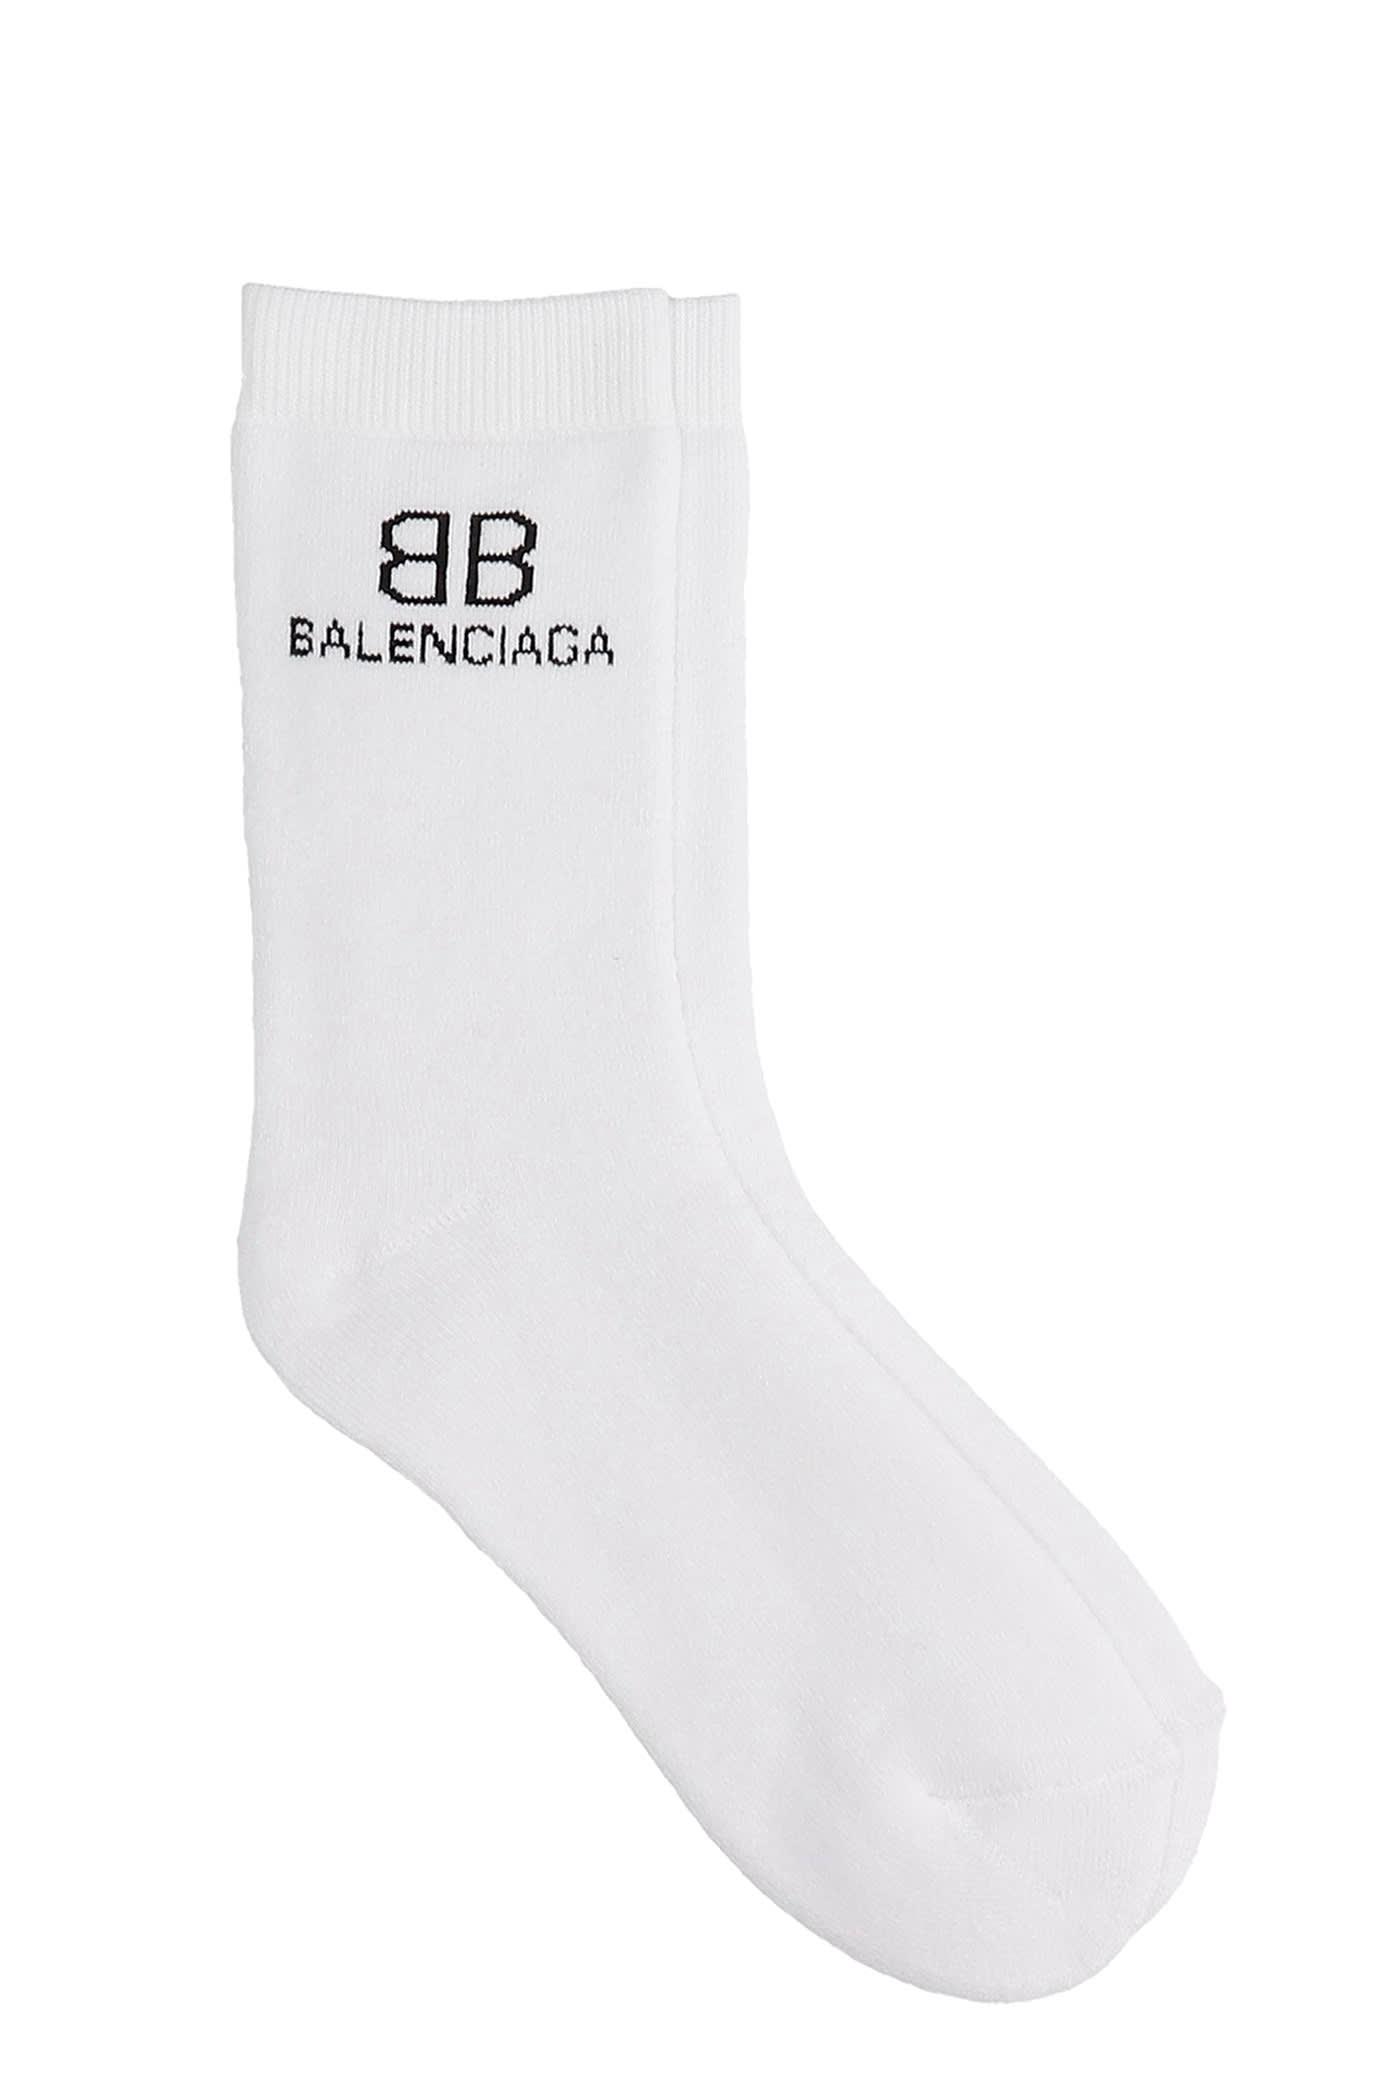 Balenciaga Socks In White Cotton